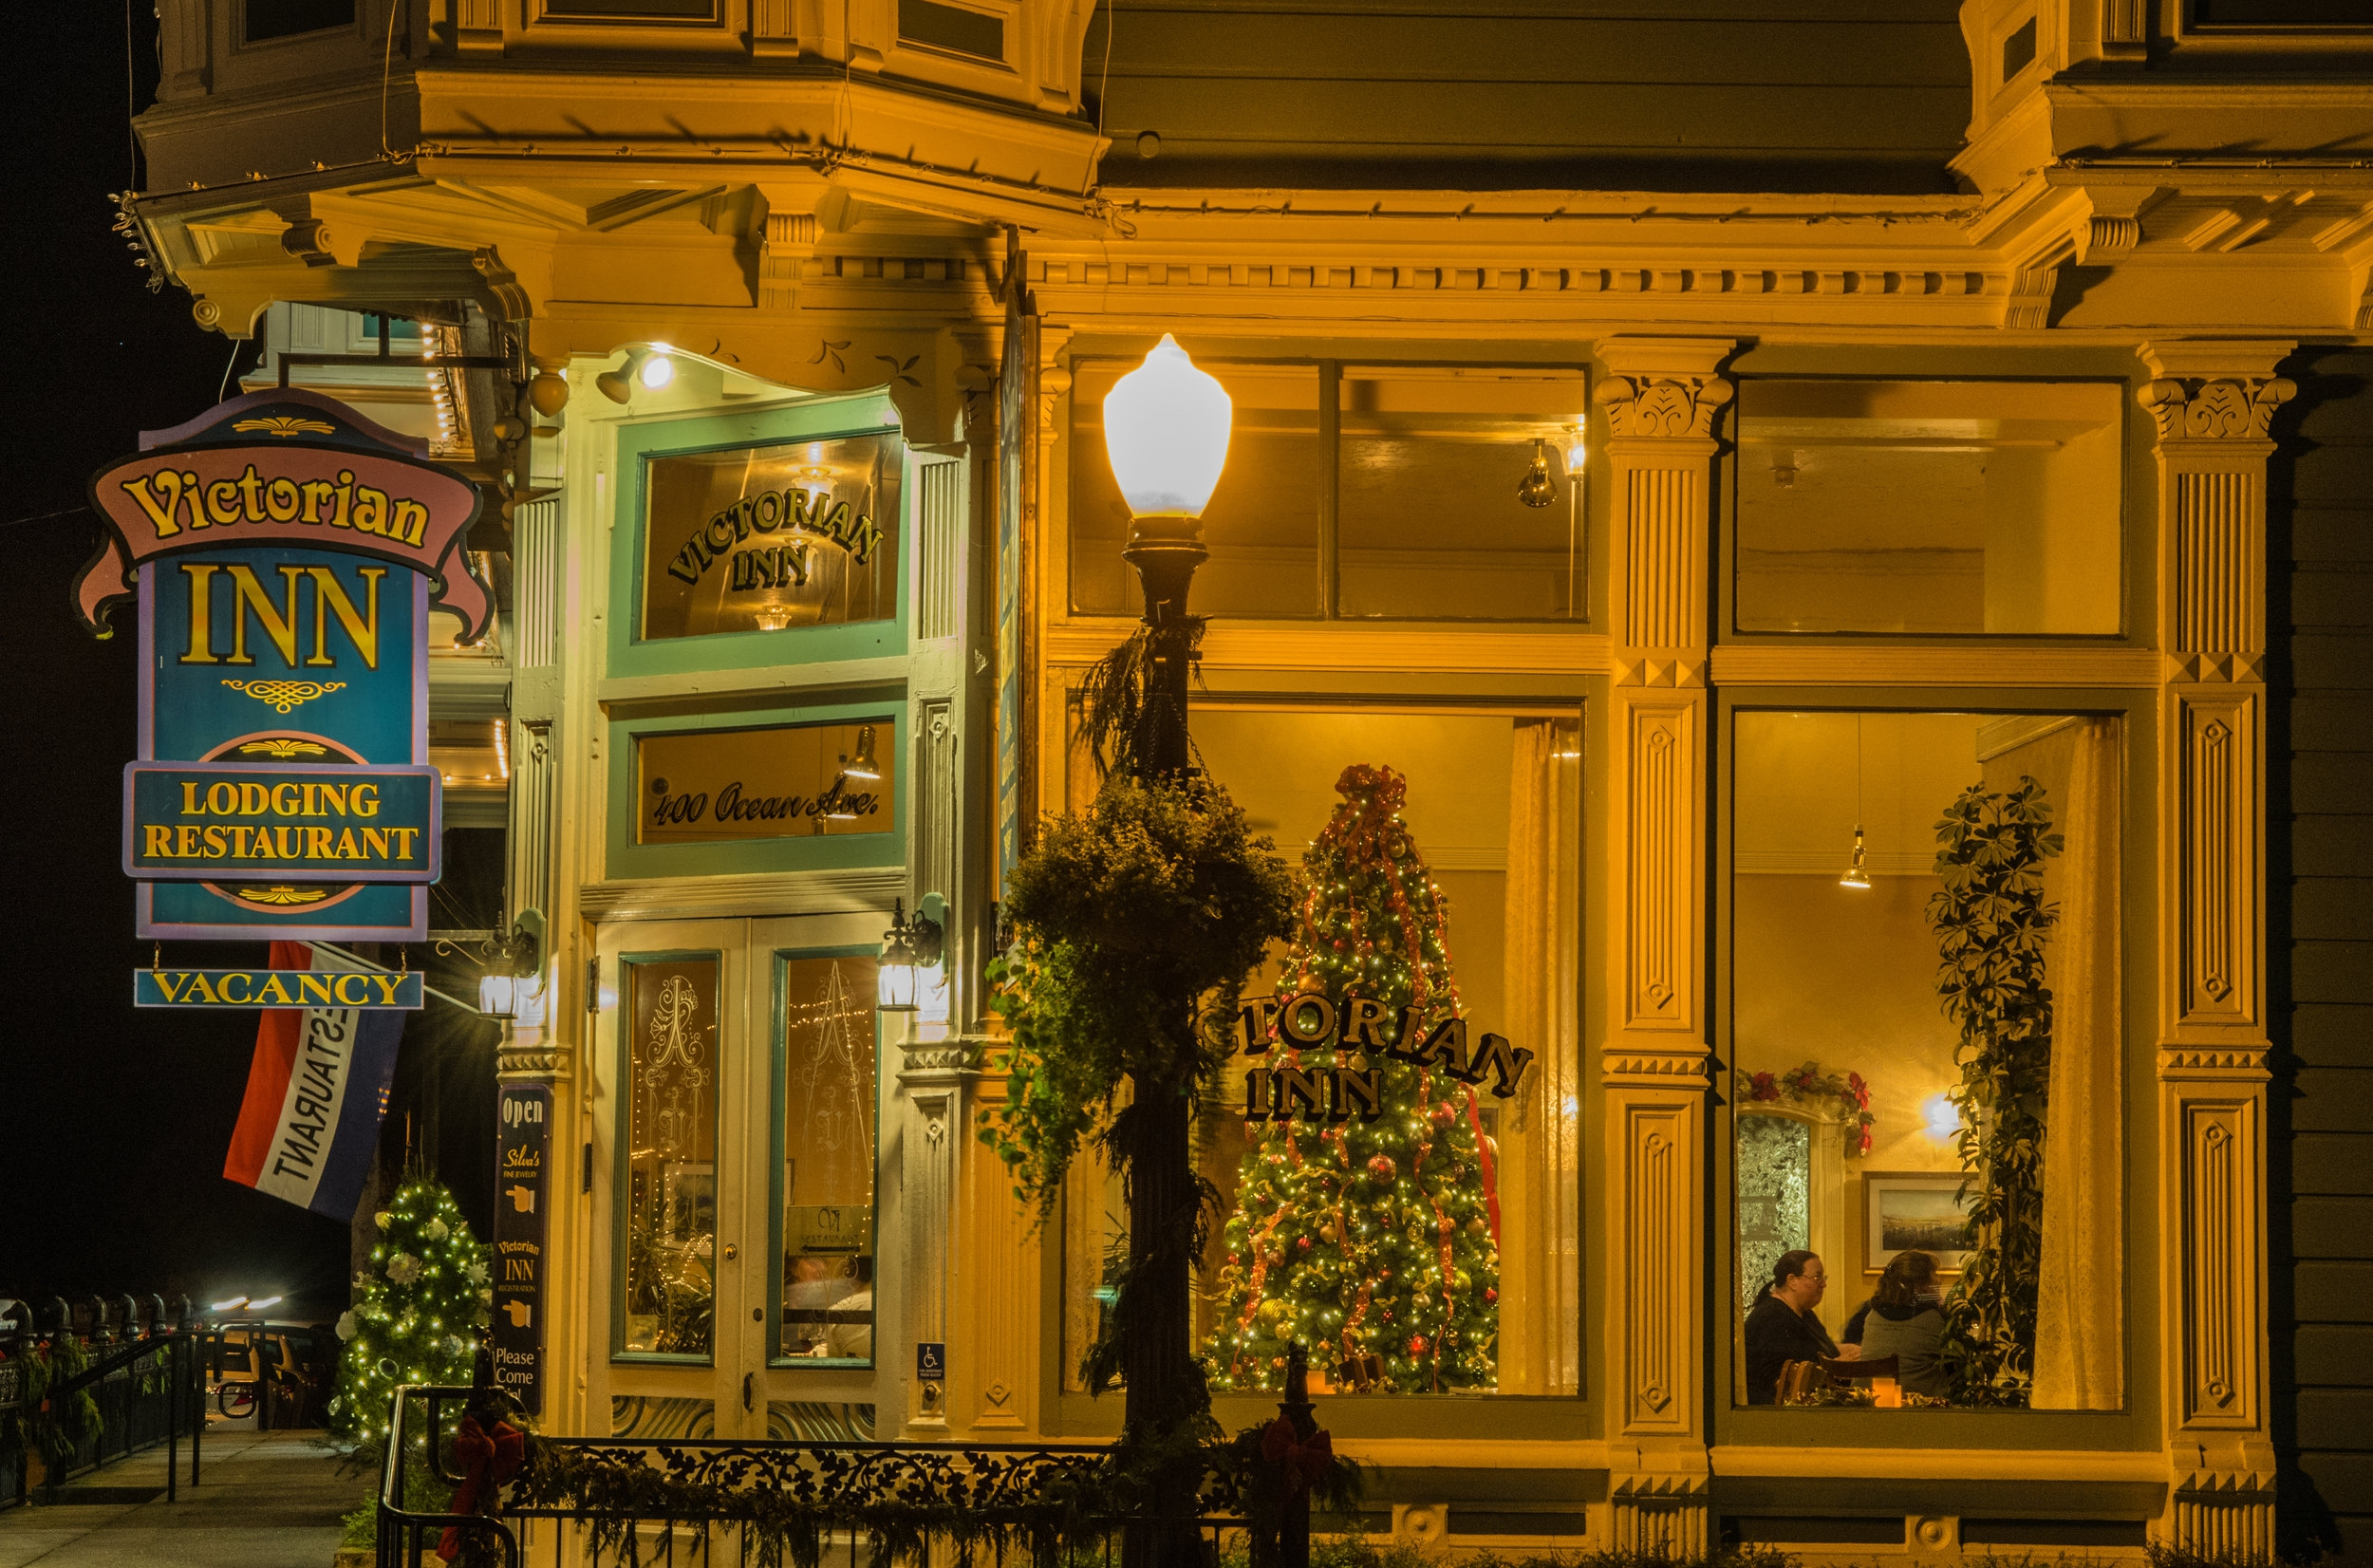 VI Restauant and the Victorian Inn   Ferndale CA